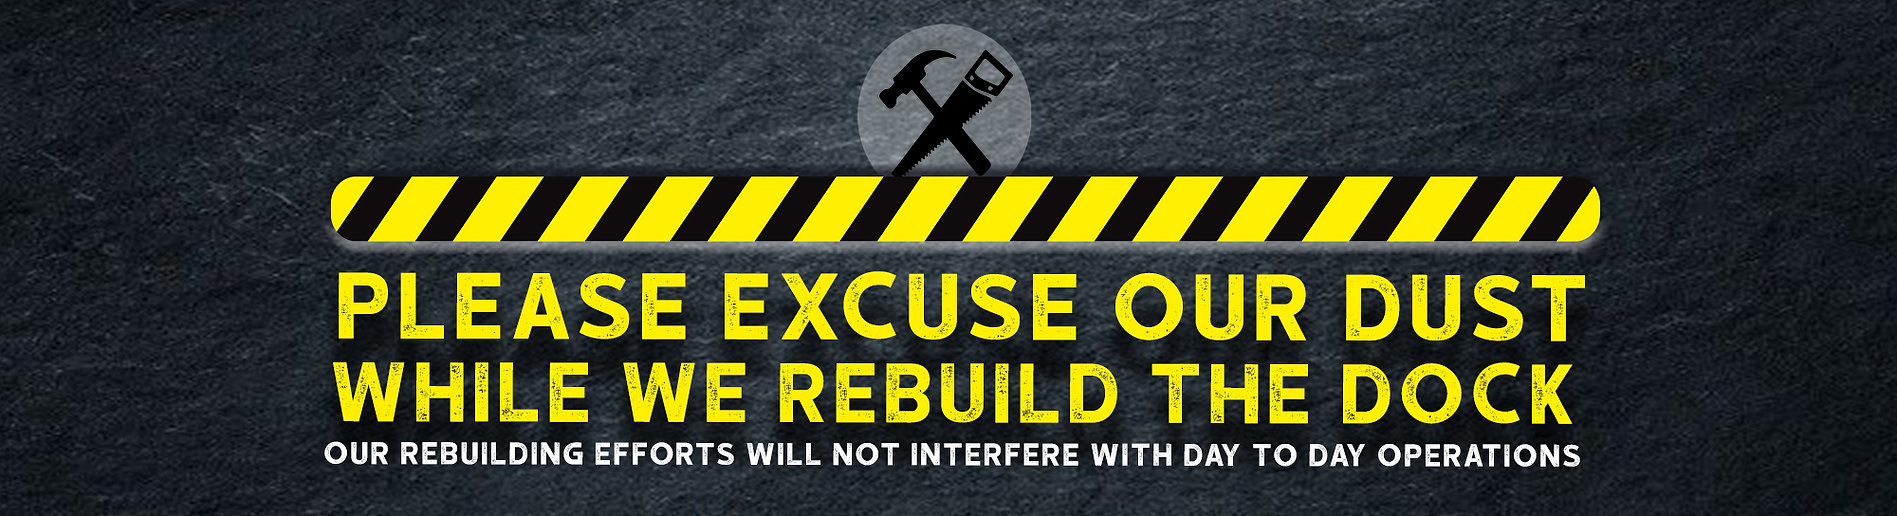 rebuild strip.jpg